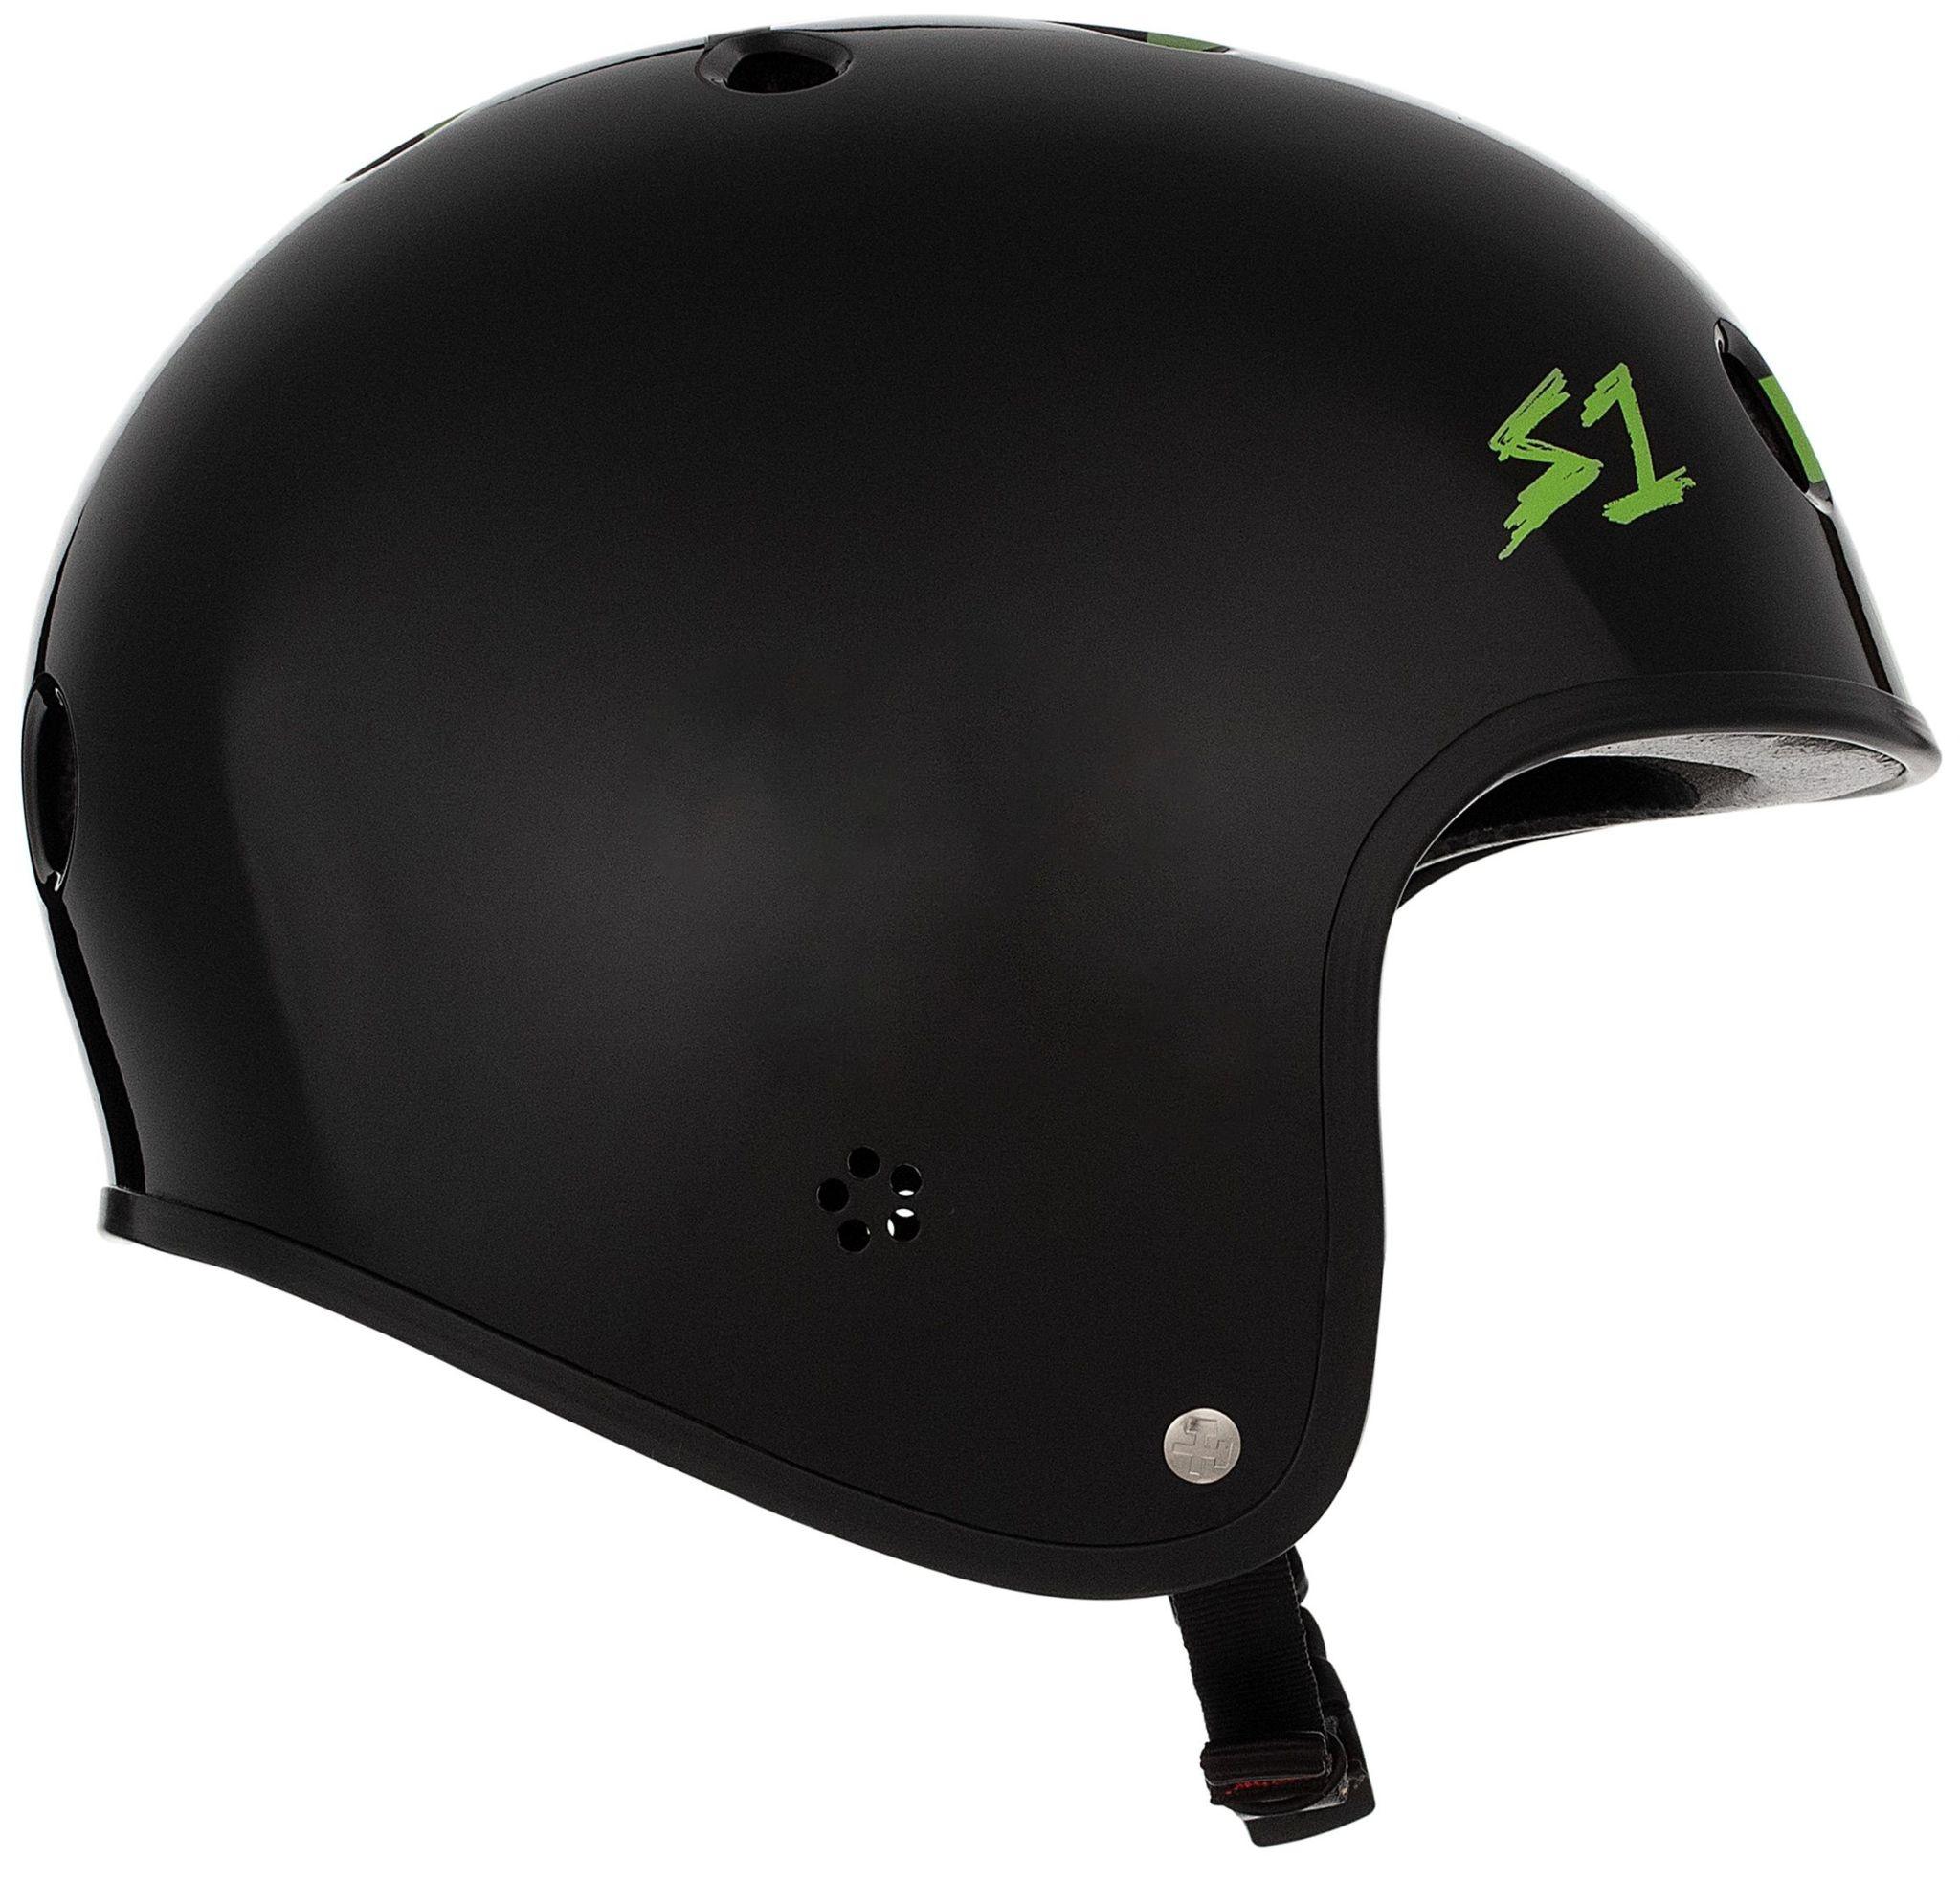 S-1 Retro Lifer Helmet - Black Gloss w/ Bright Green Checkers